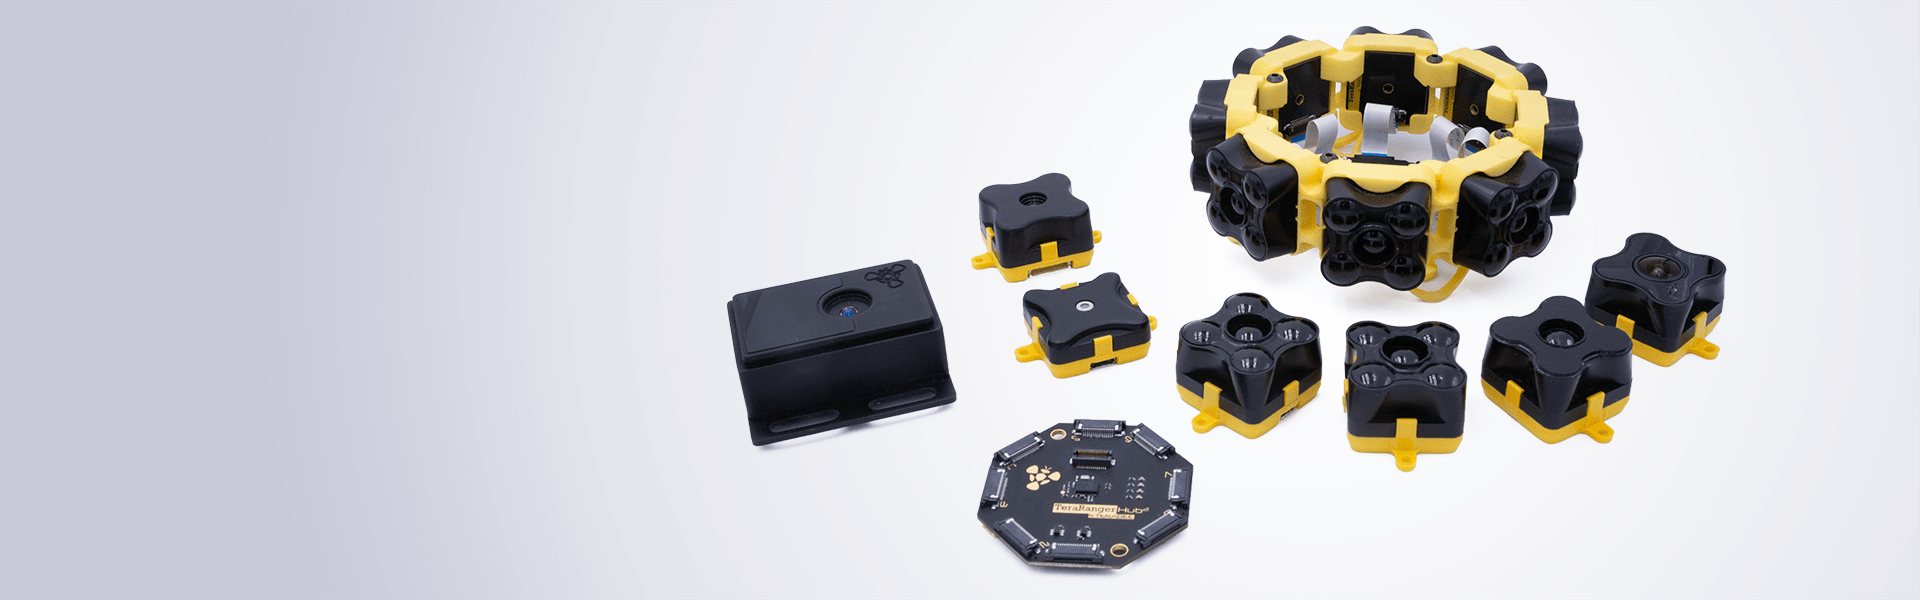 Terabee Sensor Tof Distance Sensors 3d Depth Cameras Infrared Thermal Cameras